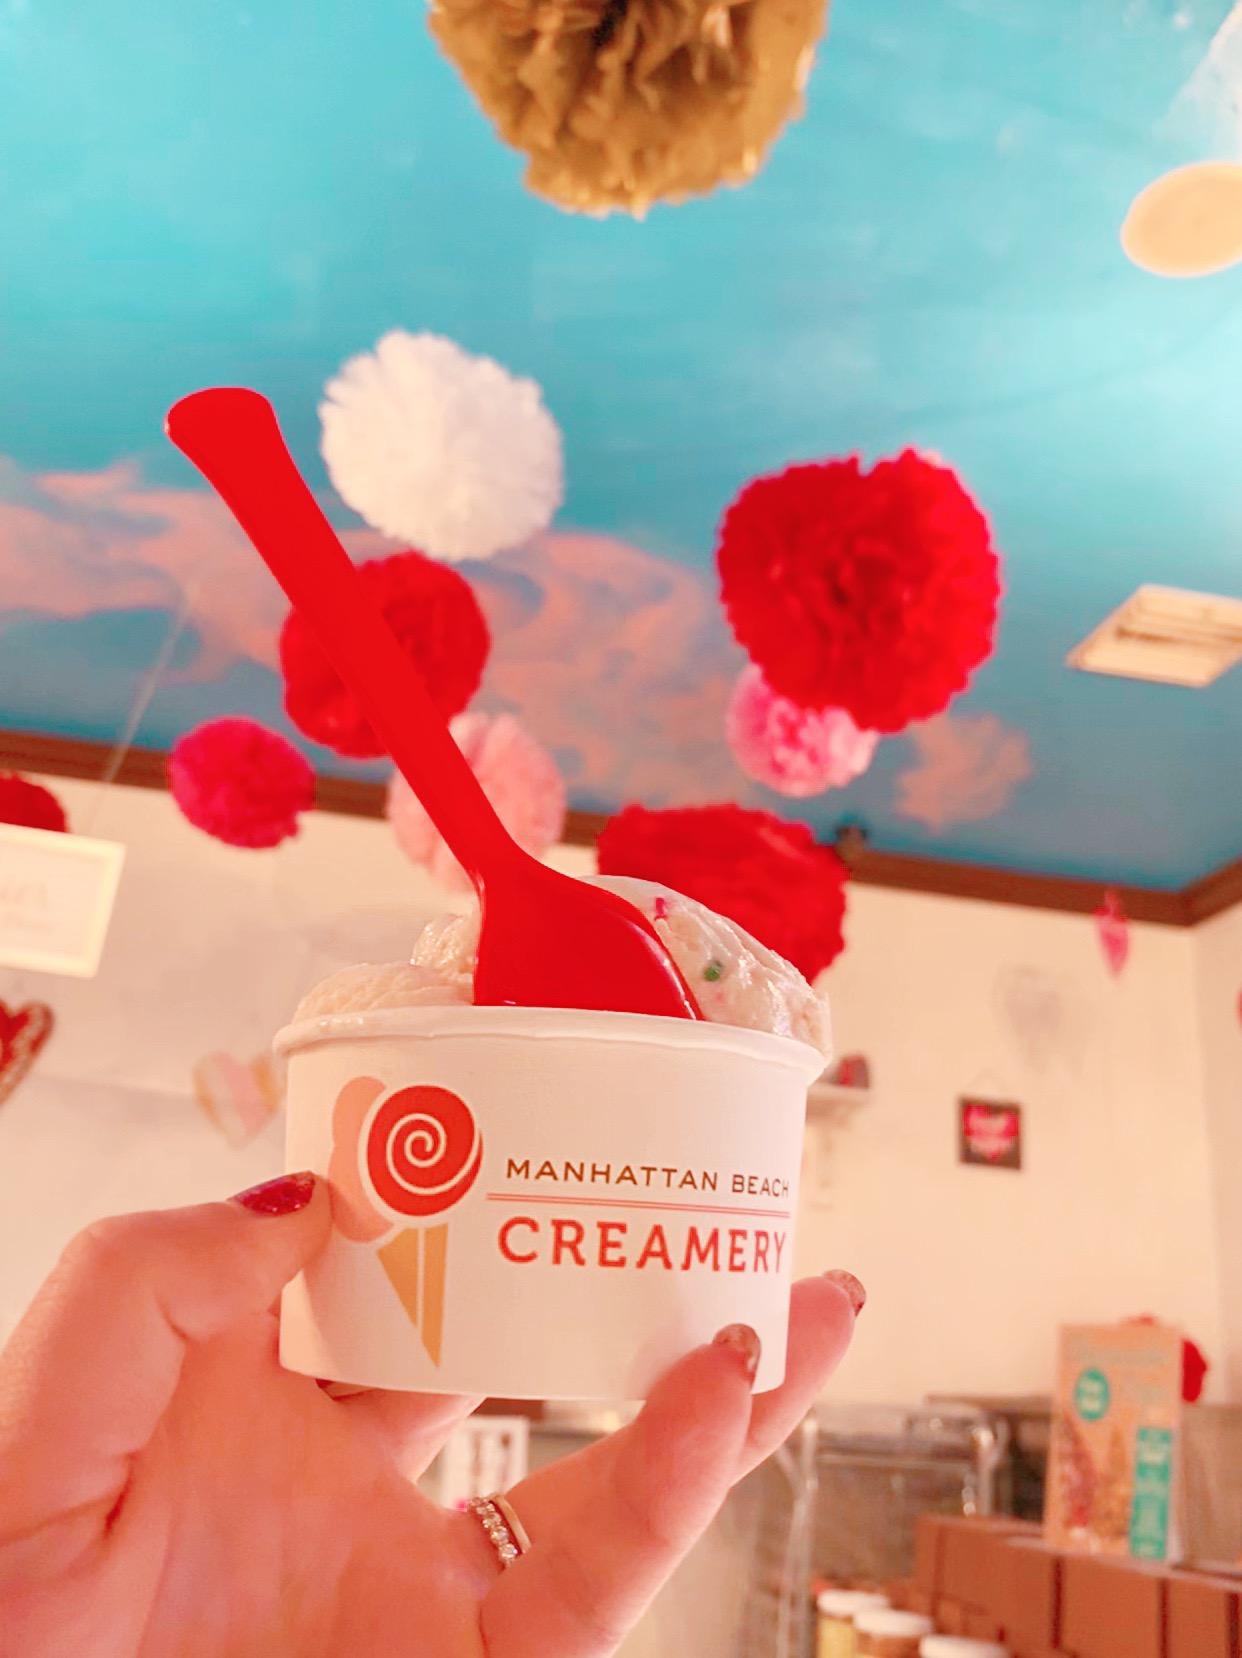 Manhattan Beach Creamery - Super Sonic Ice Cream